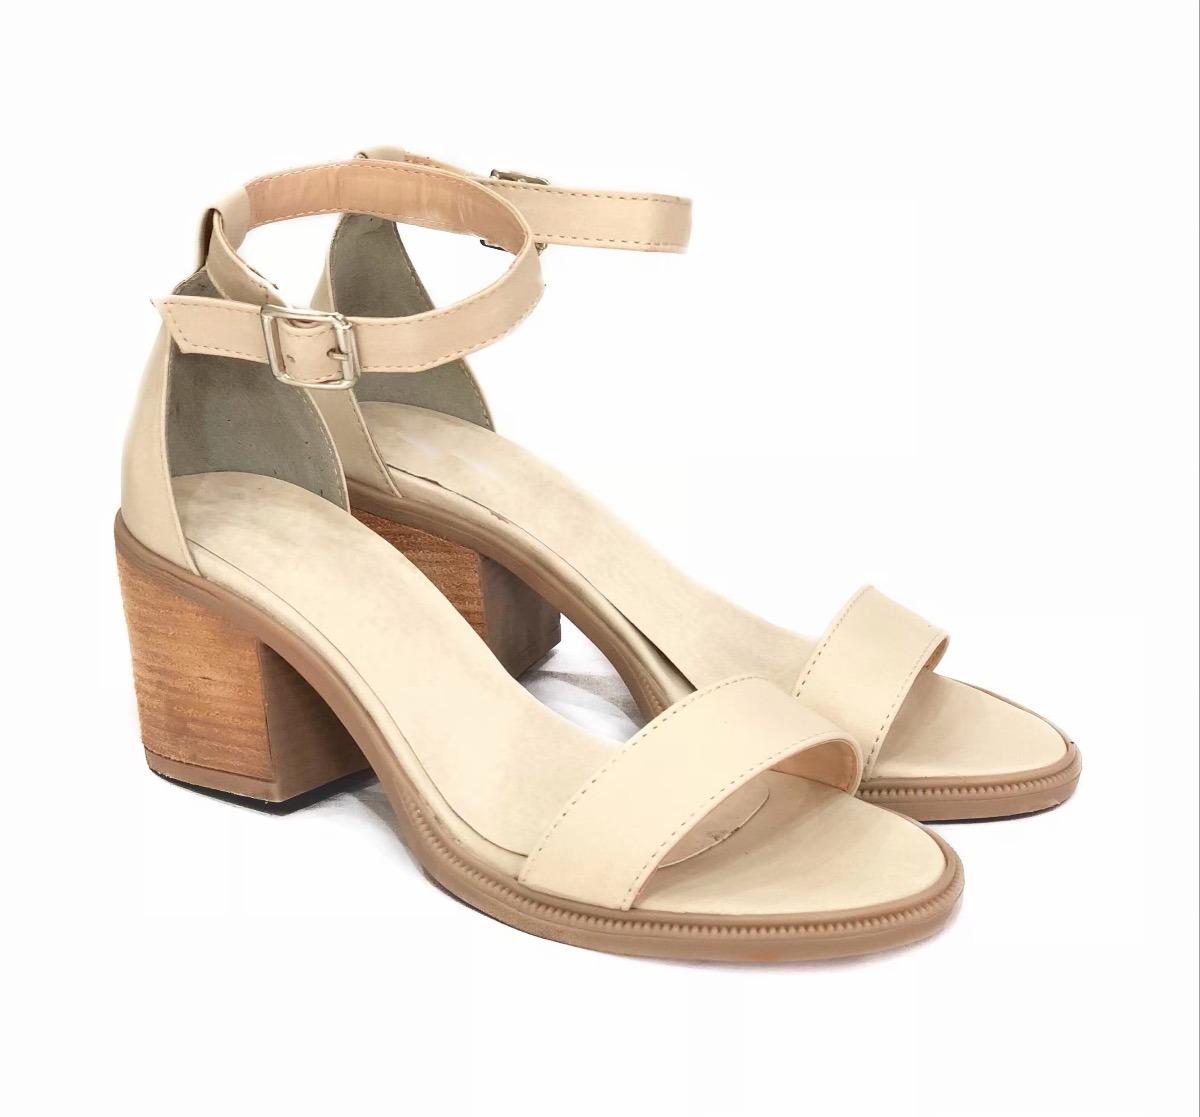 e74eed25fc5 sandalias clásicas zapatos señora taco cuero mujer mousse. Cargando zoom.